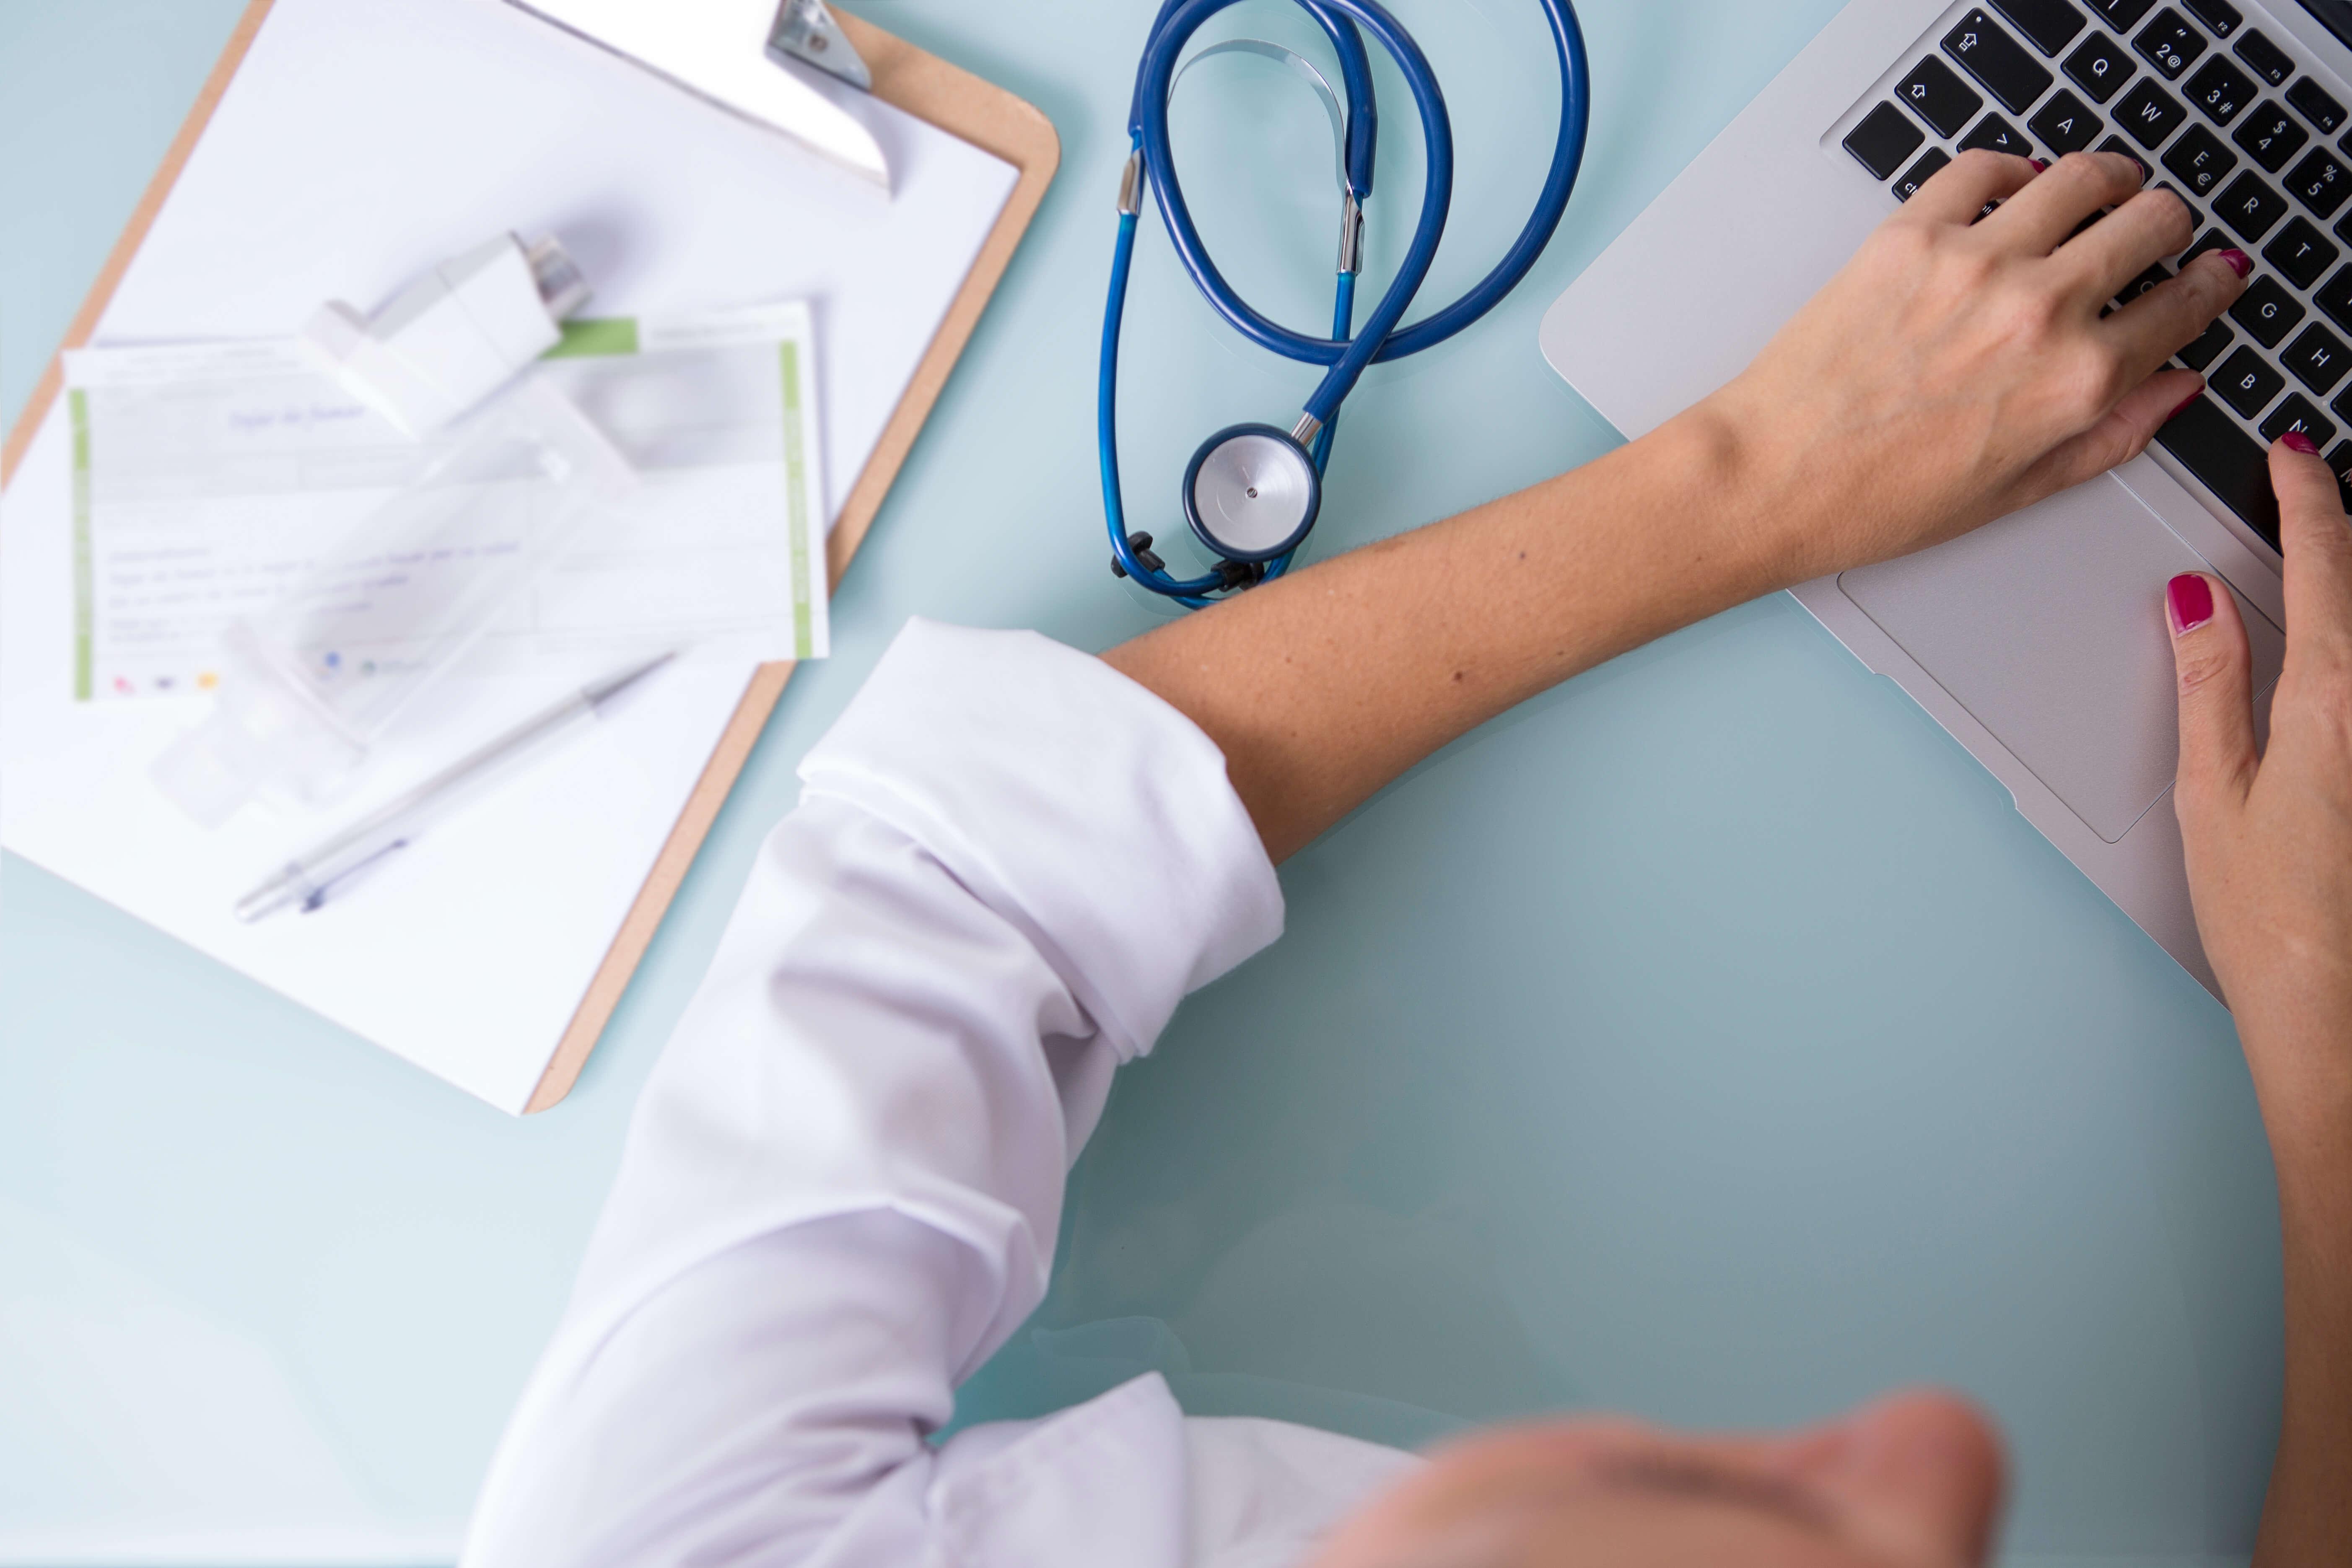 CentreSpringMD Integrative Medical Center